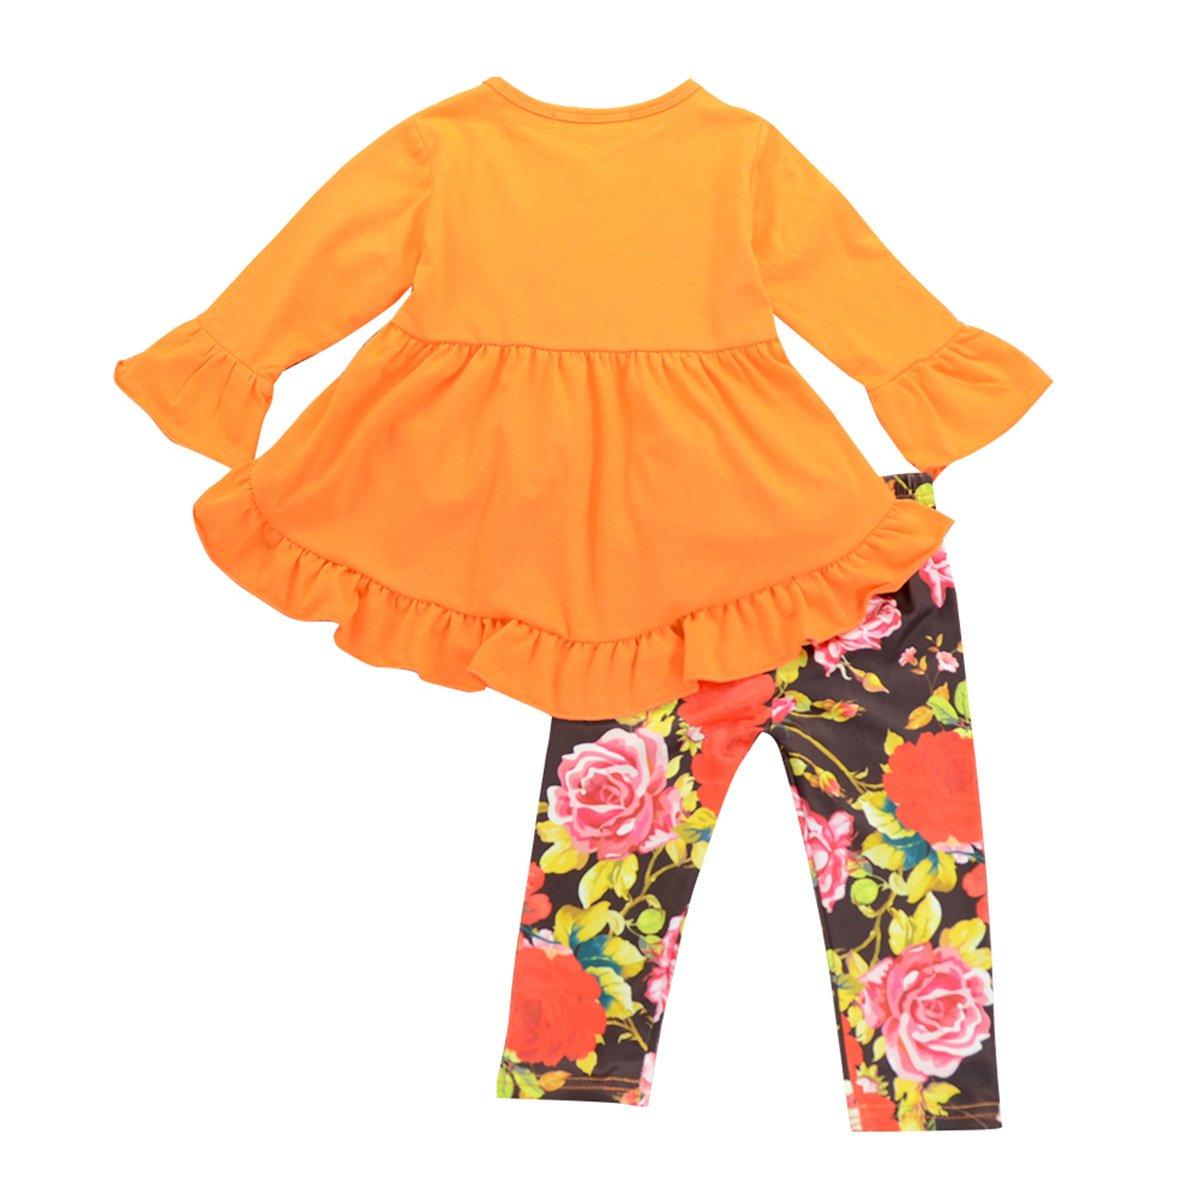 Amazon.com  Toddler Girls Ruffle Dress Shirt Tops   Floral Legging Pants  Princess Outfits Set  Clothing 4469165d30b1